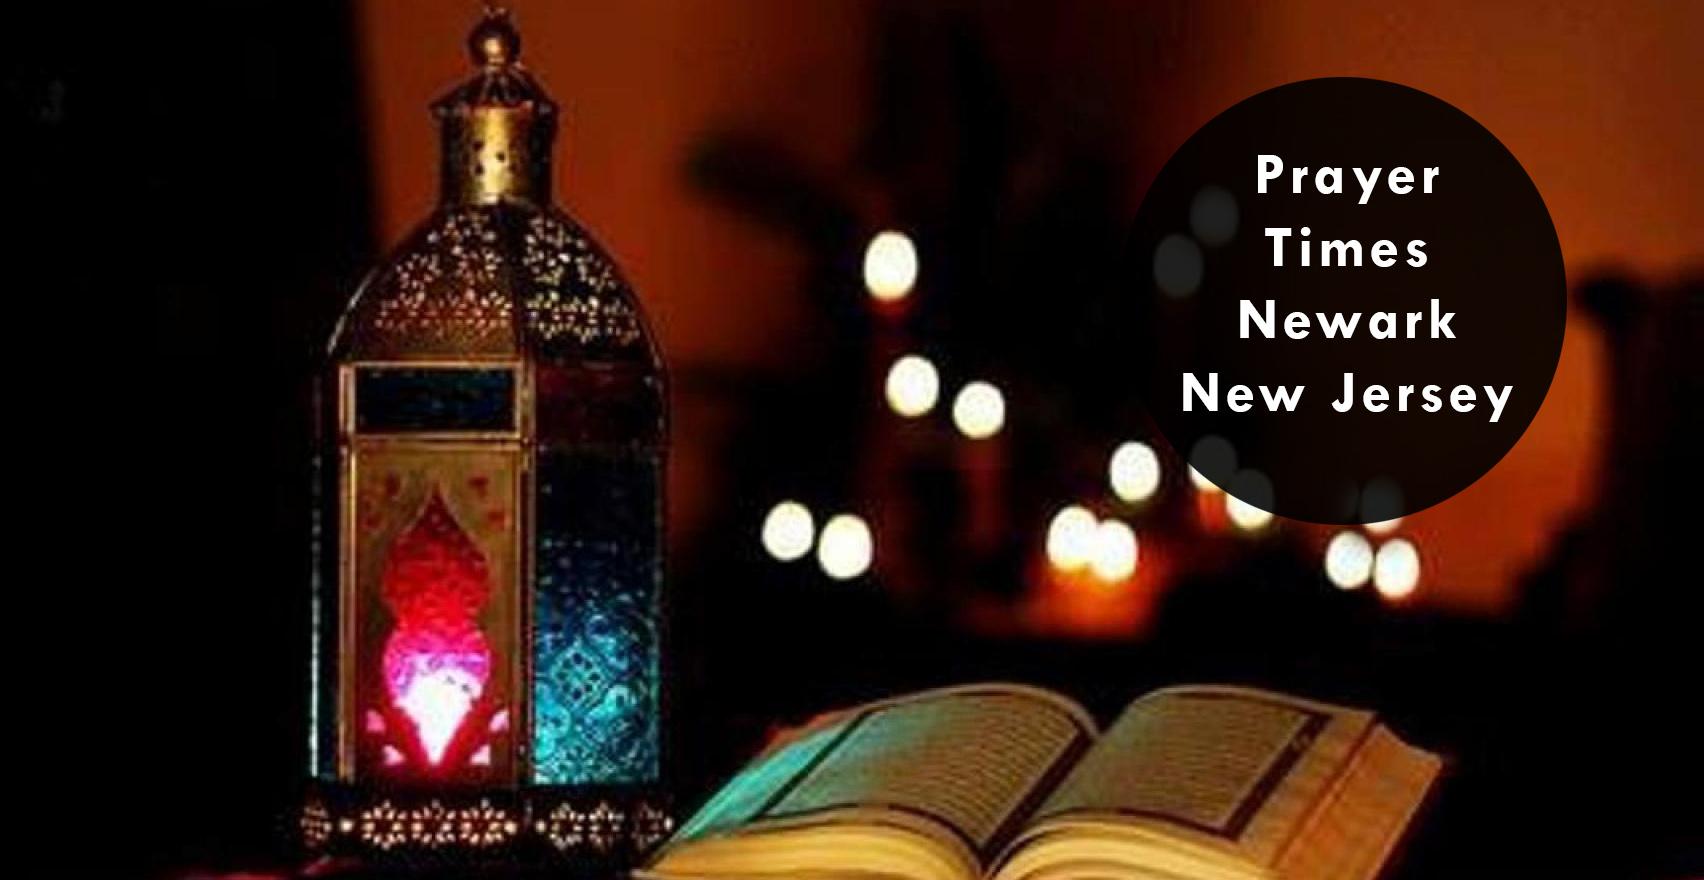 prayer times newark